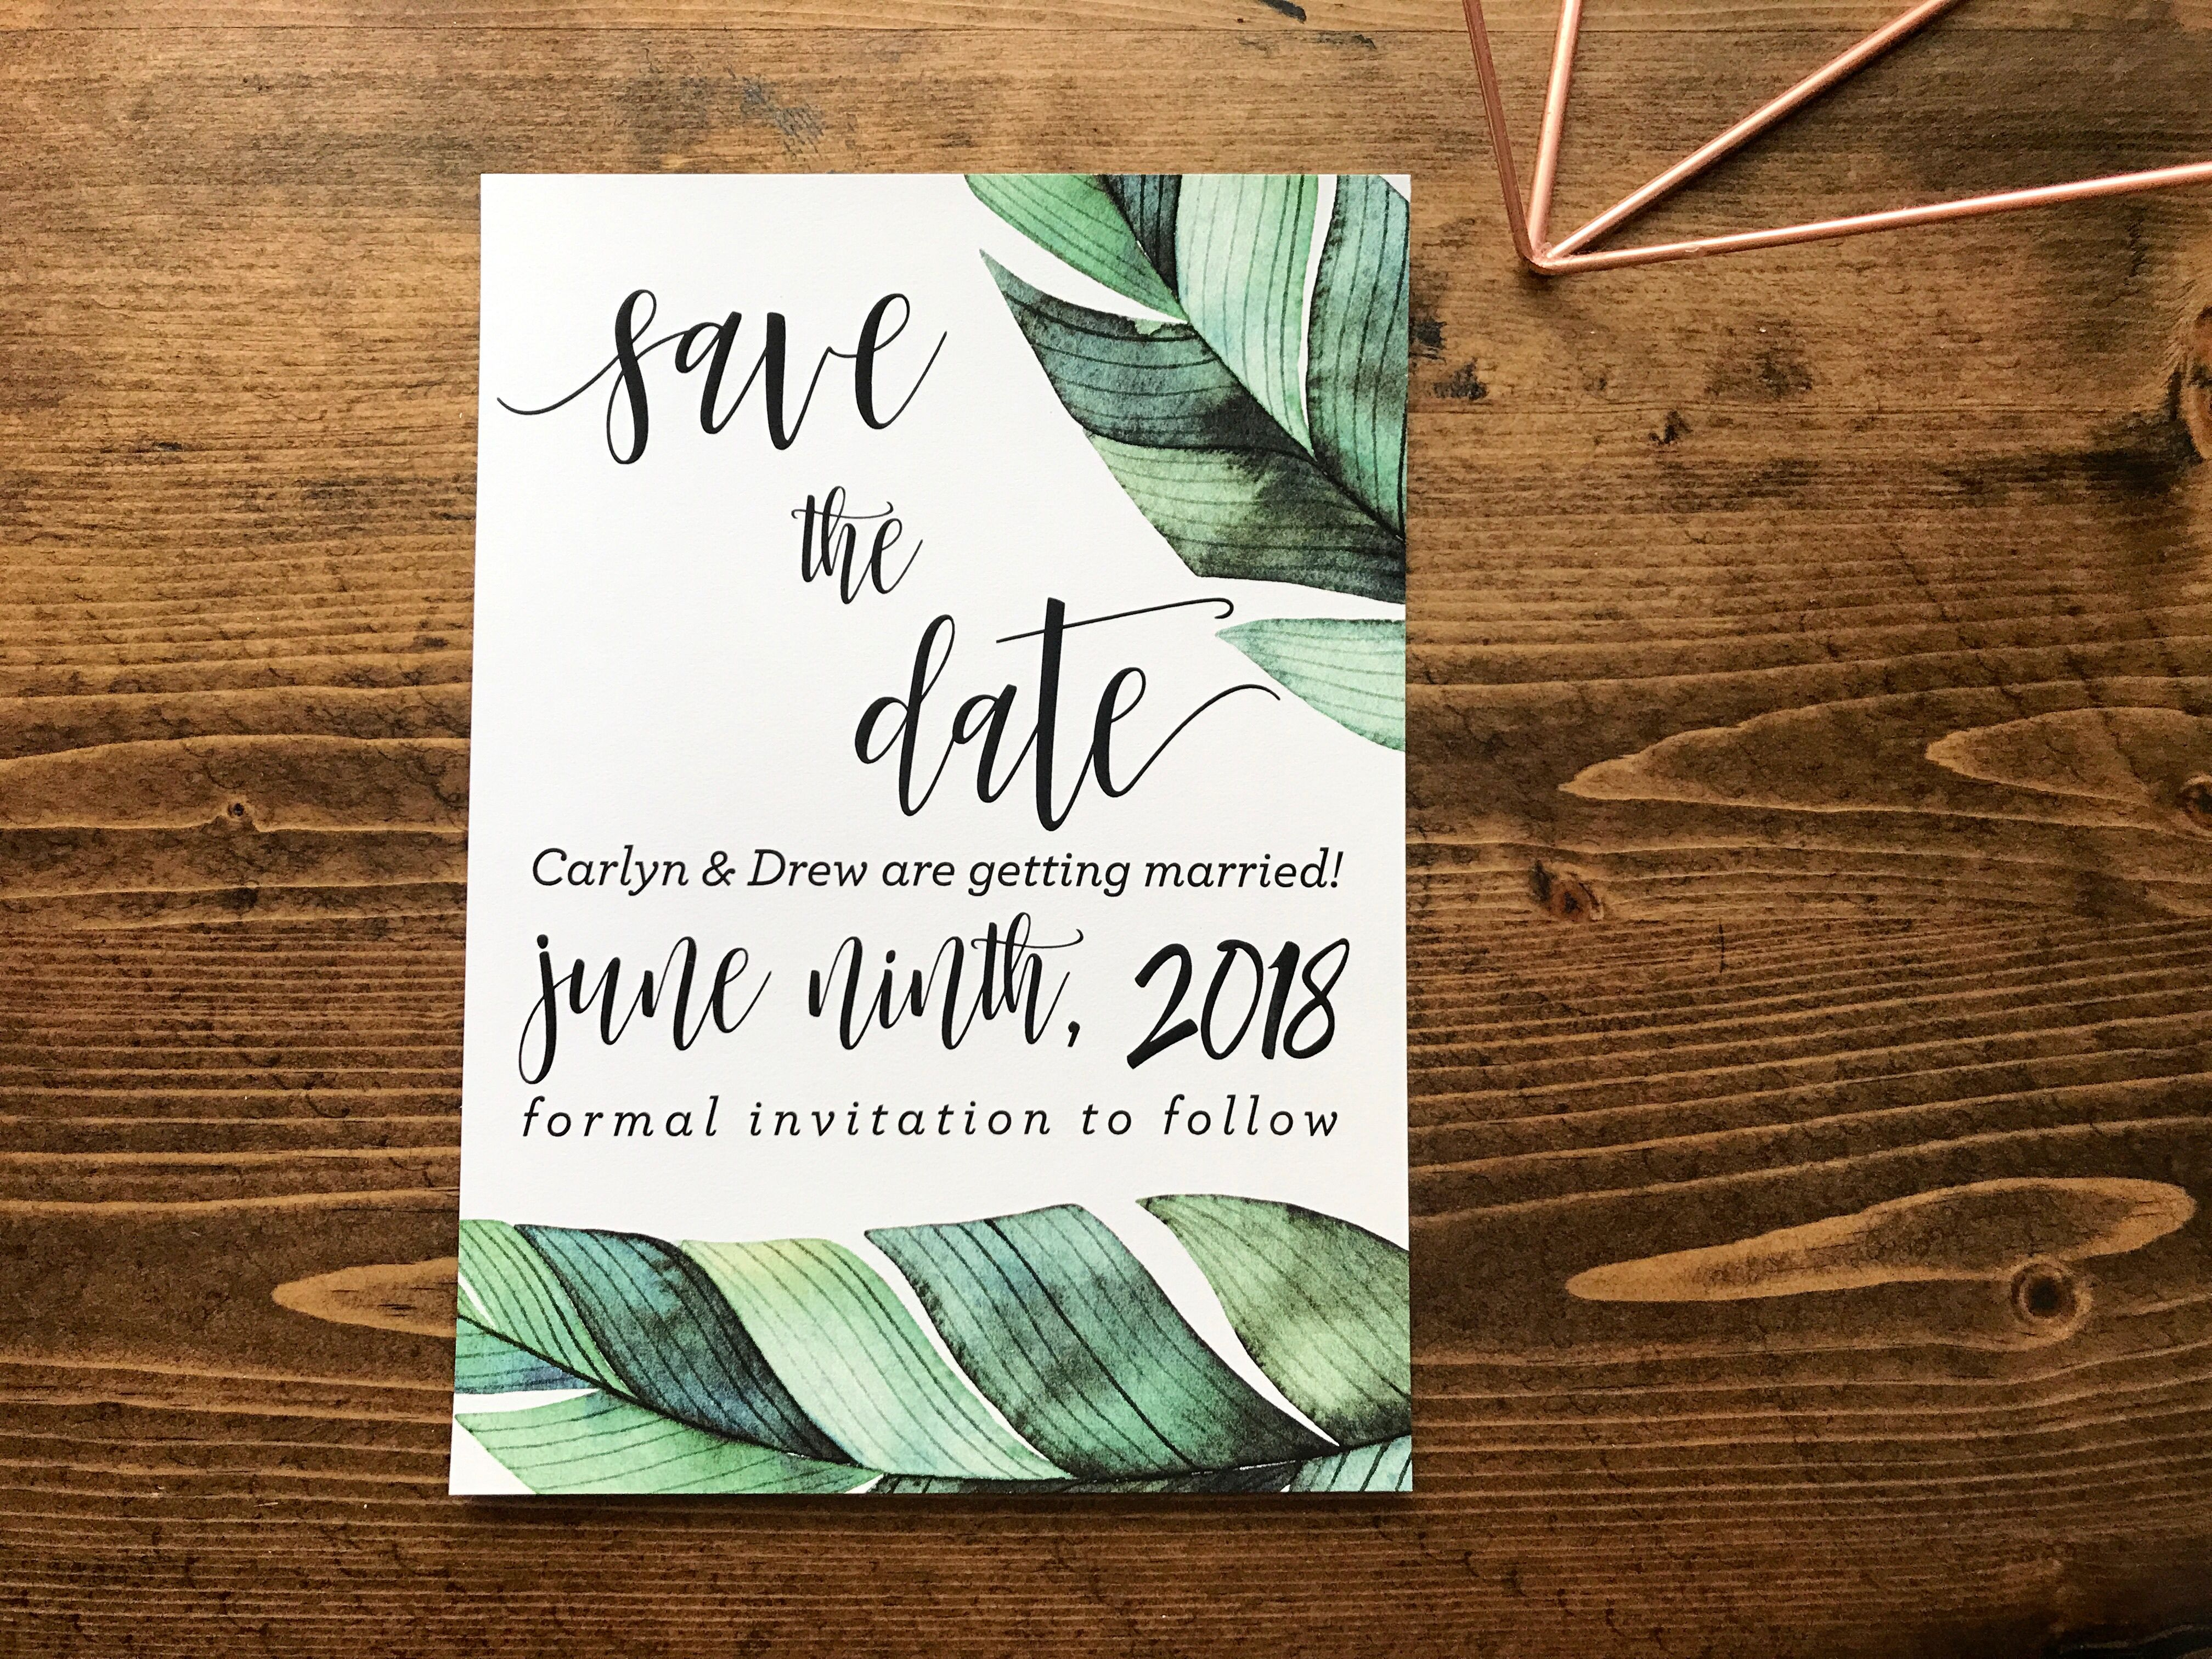 Printable Invitations Stationery u0026 Custom Designs by